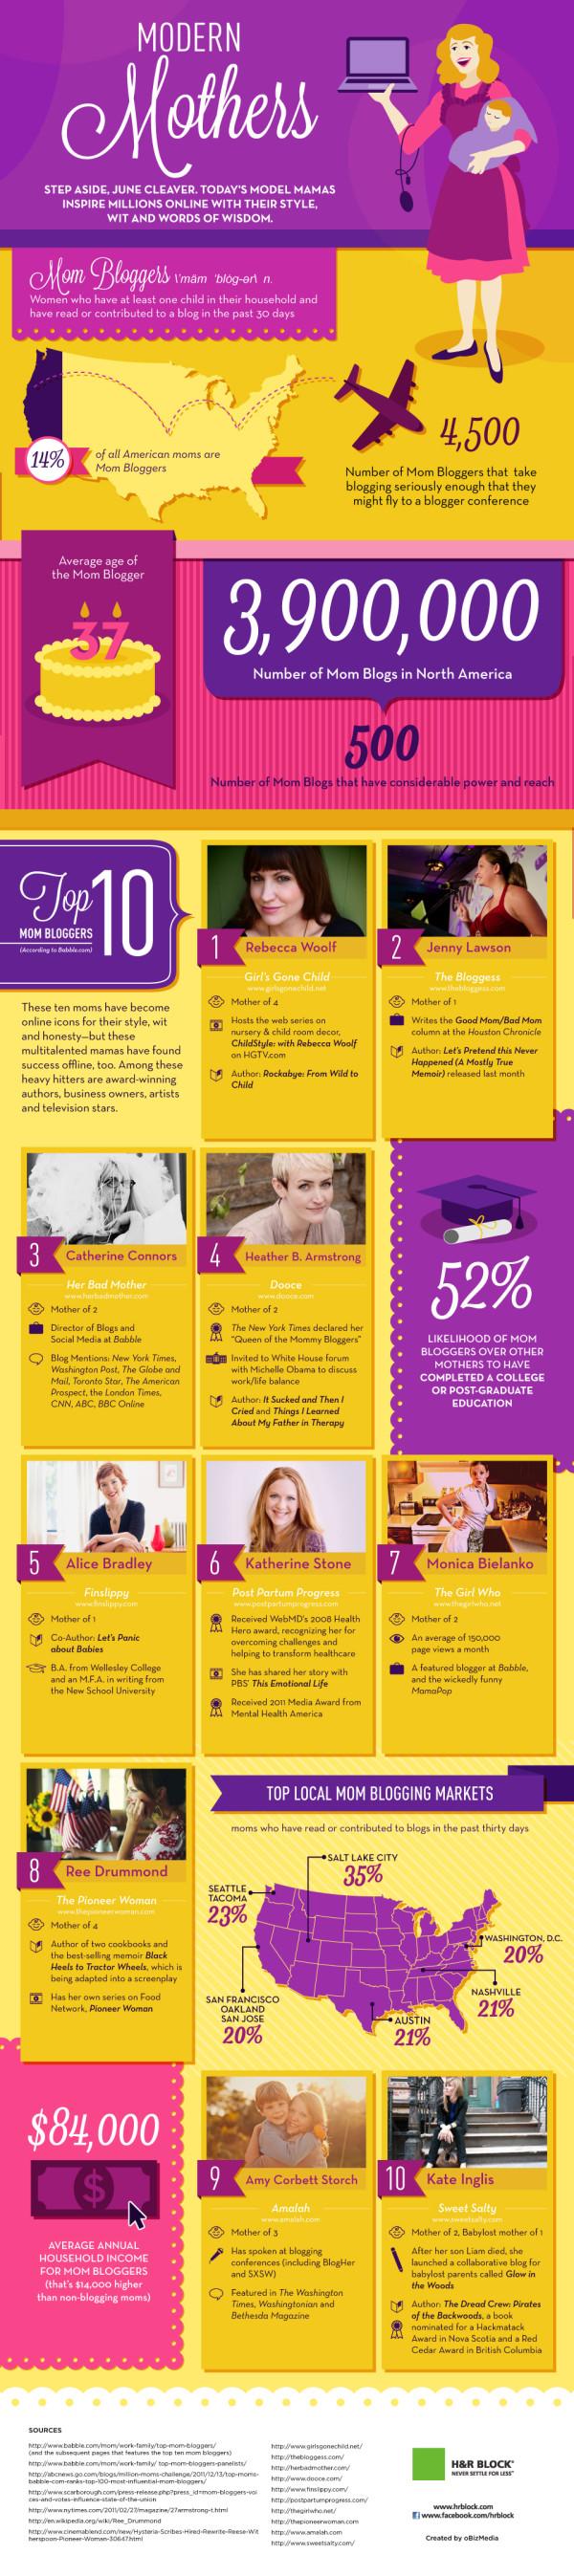 Mom_Bloggers_Infographic